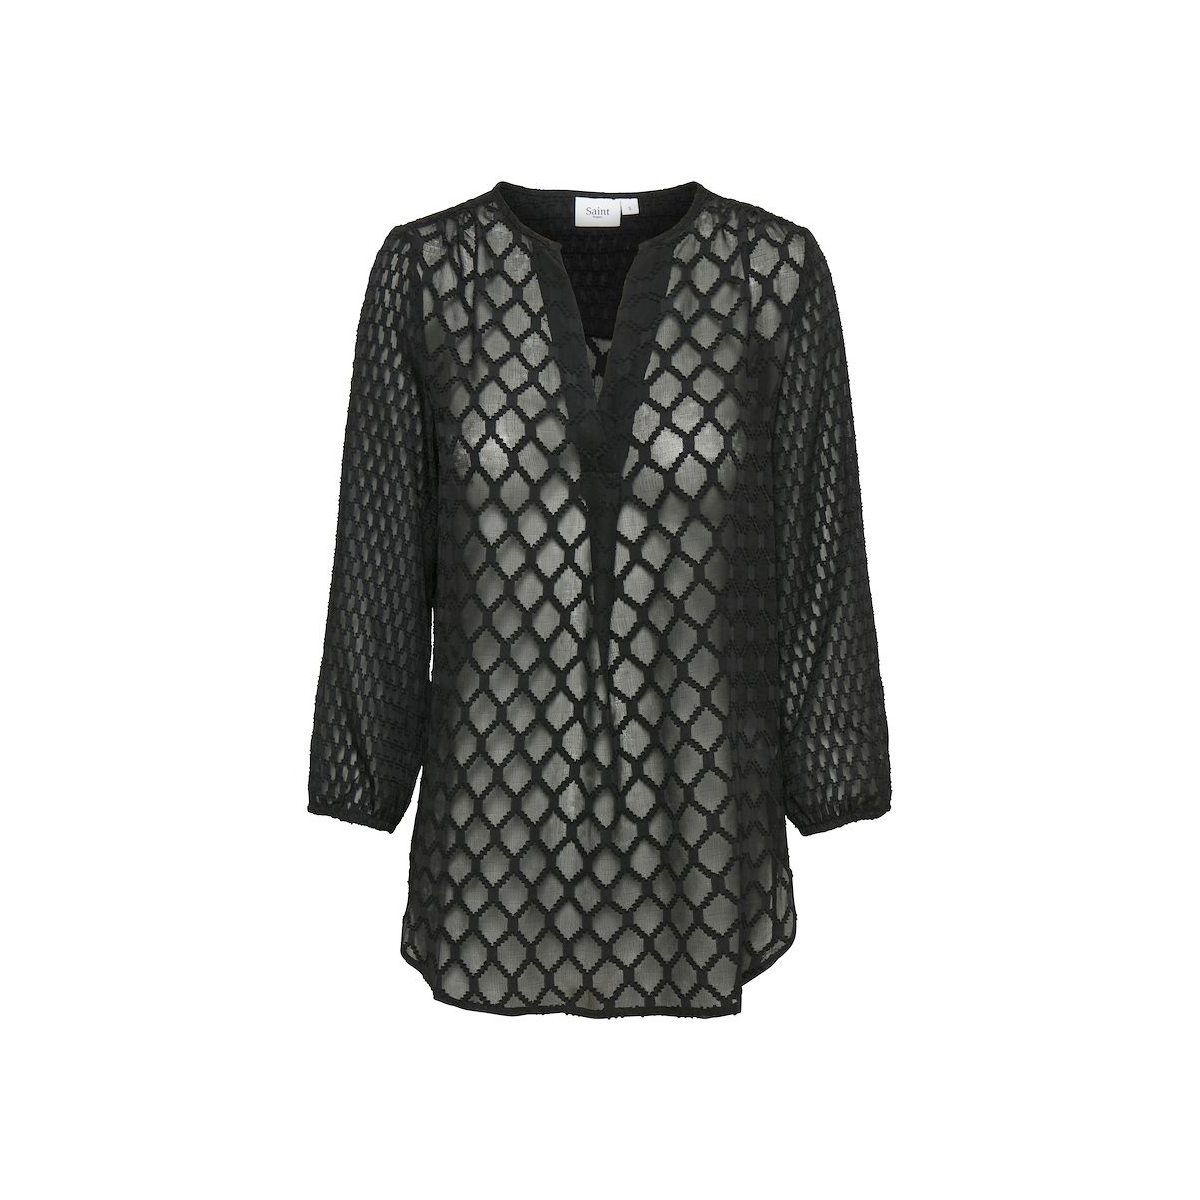 u1046 woven shirt saint tropez t-shirt 0001